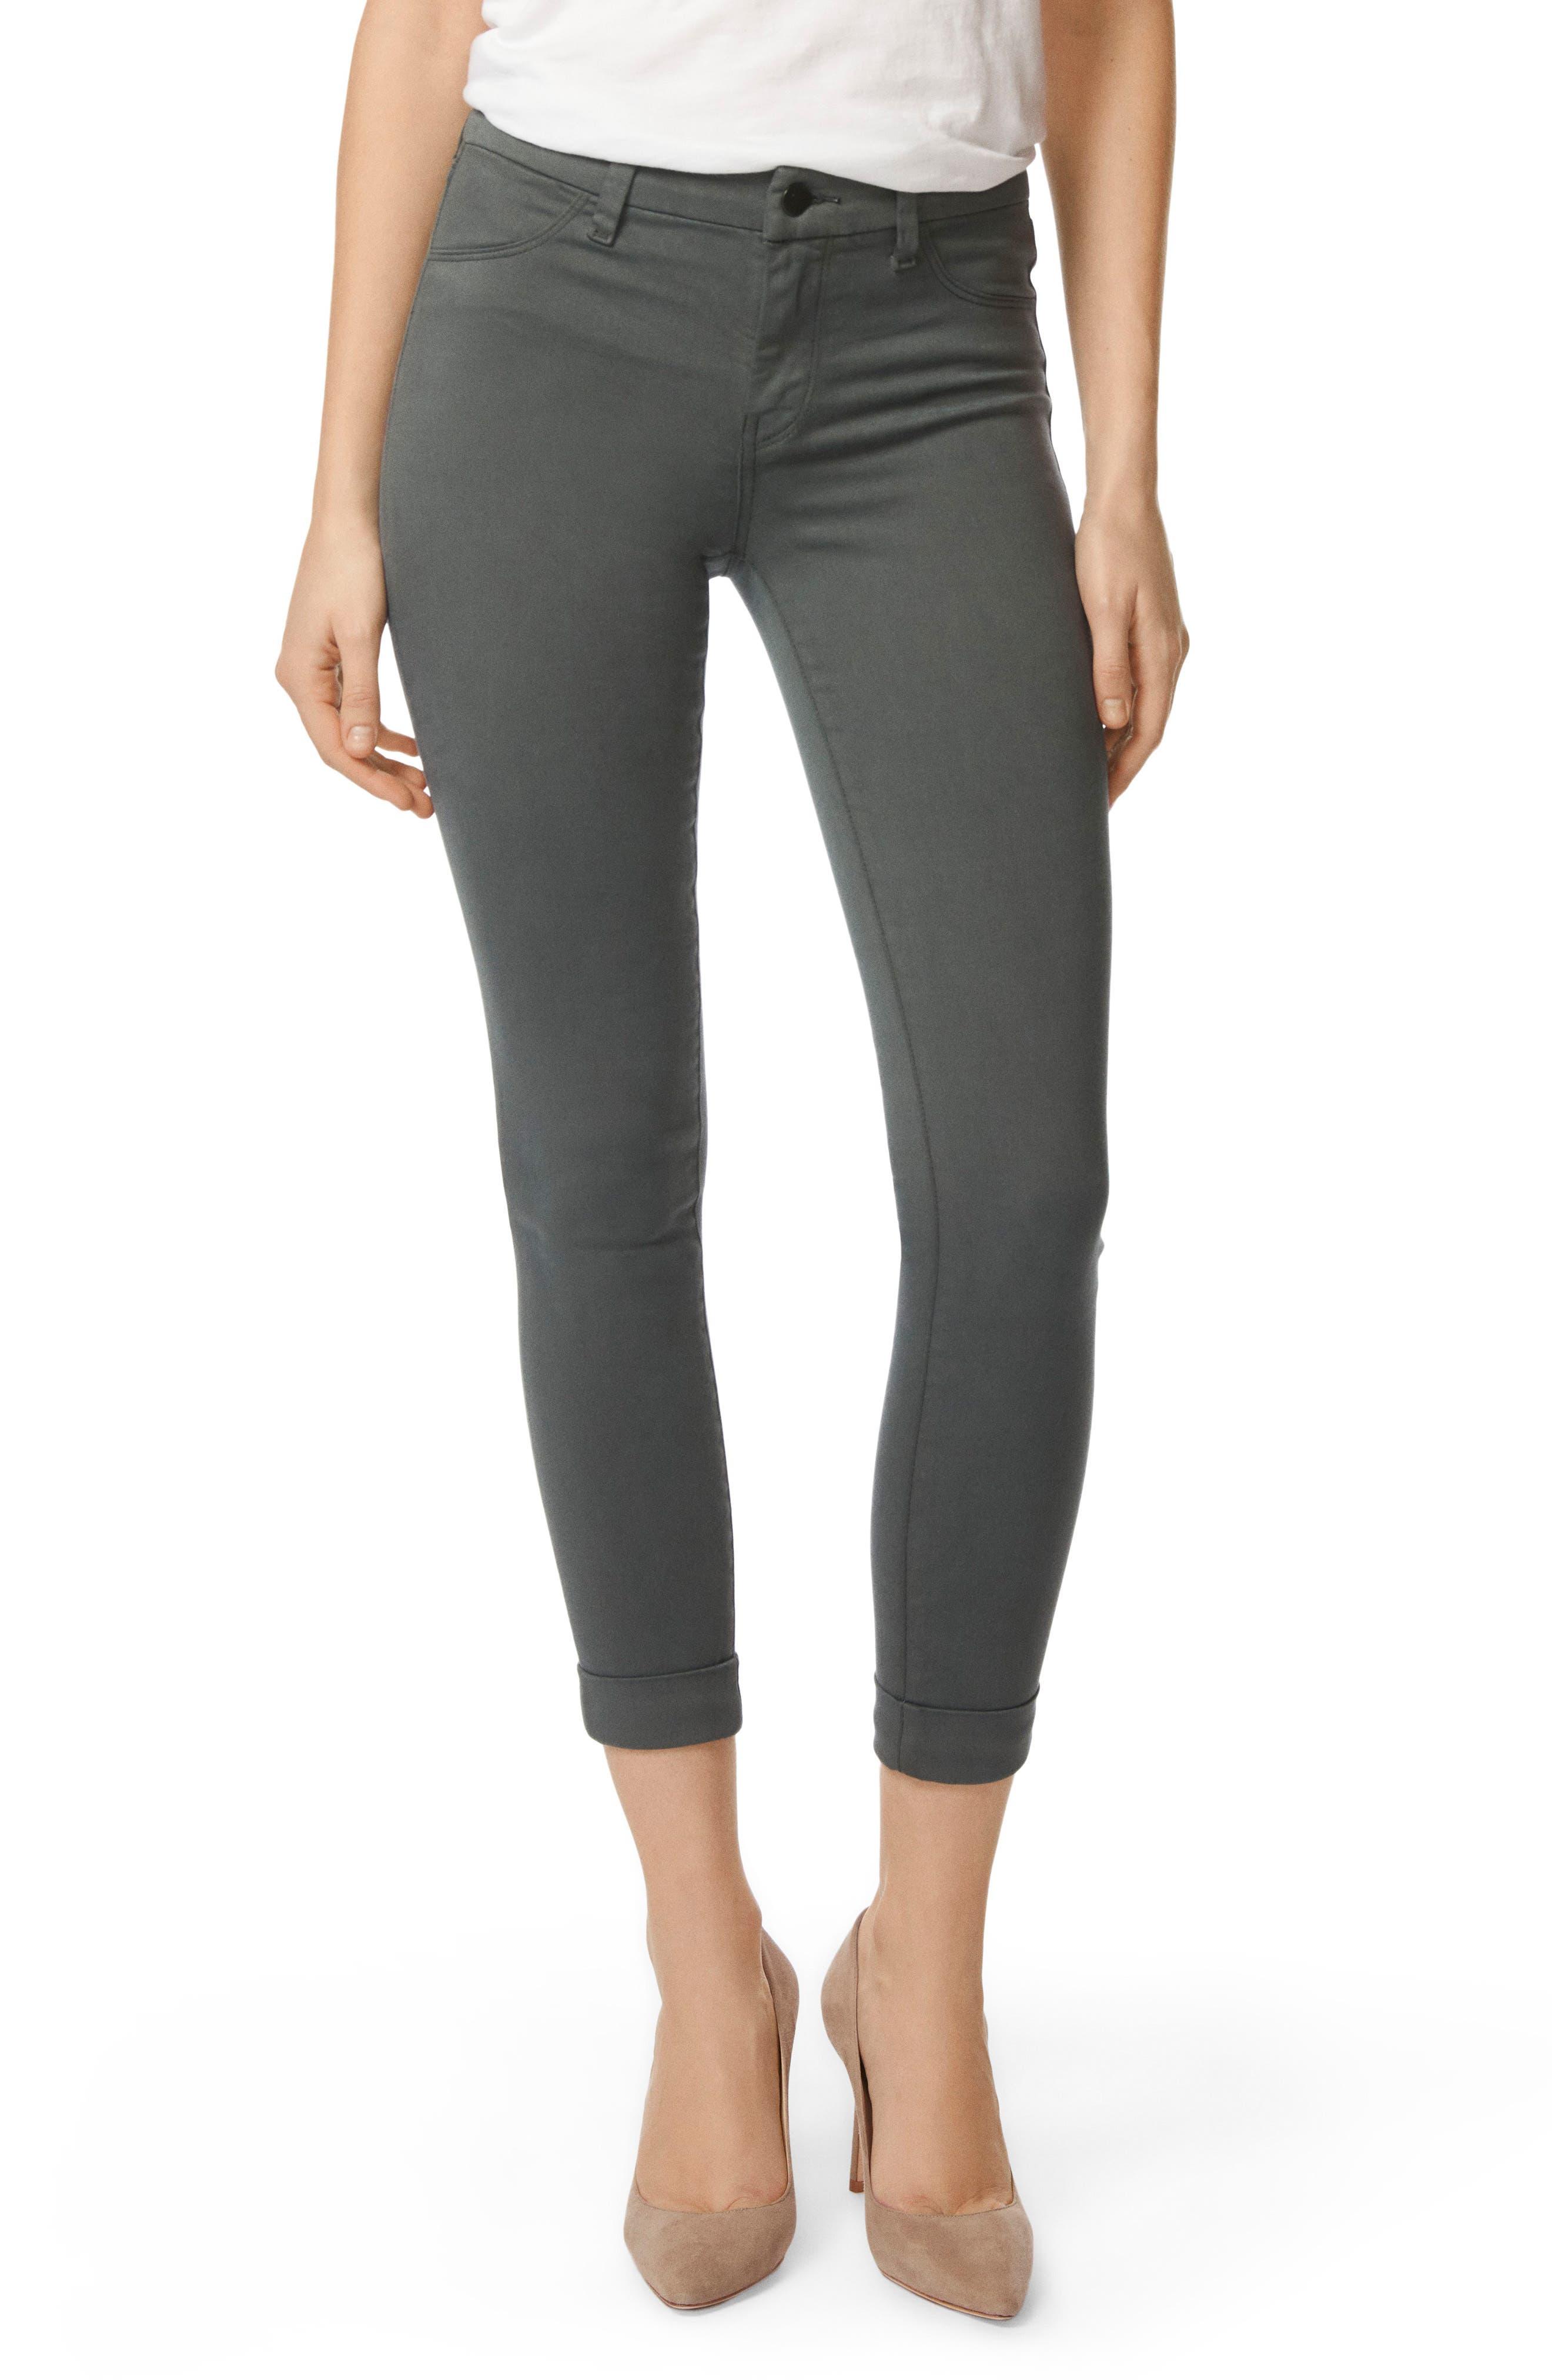 Anja Crop Skinny Jeans - Green Size 32